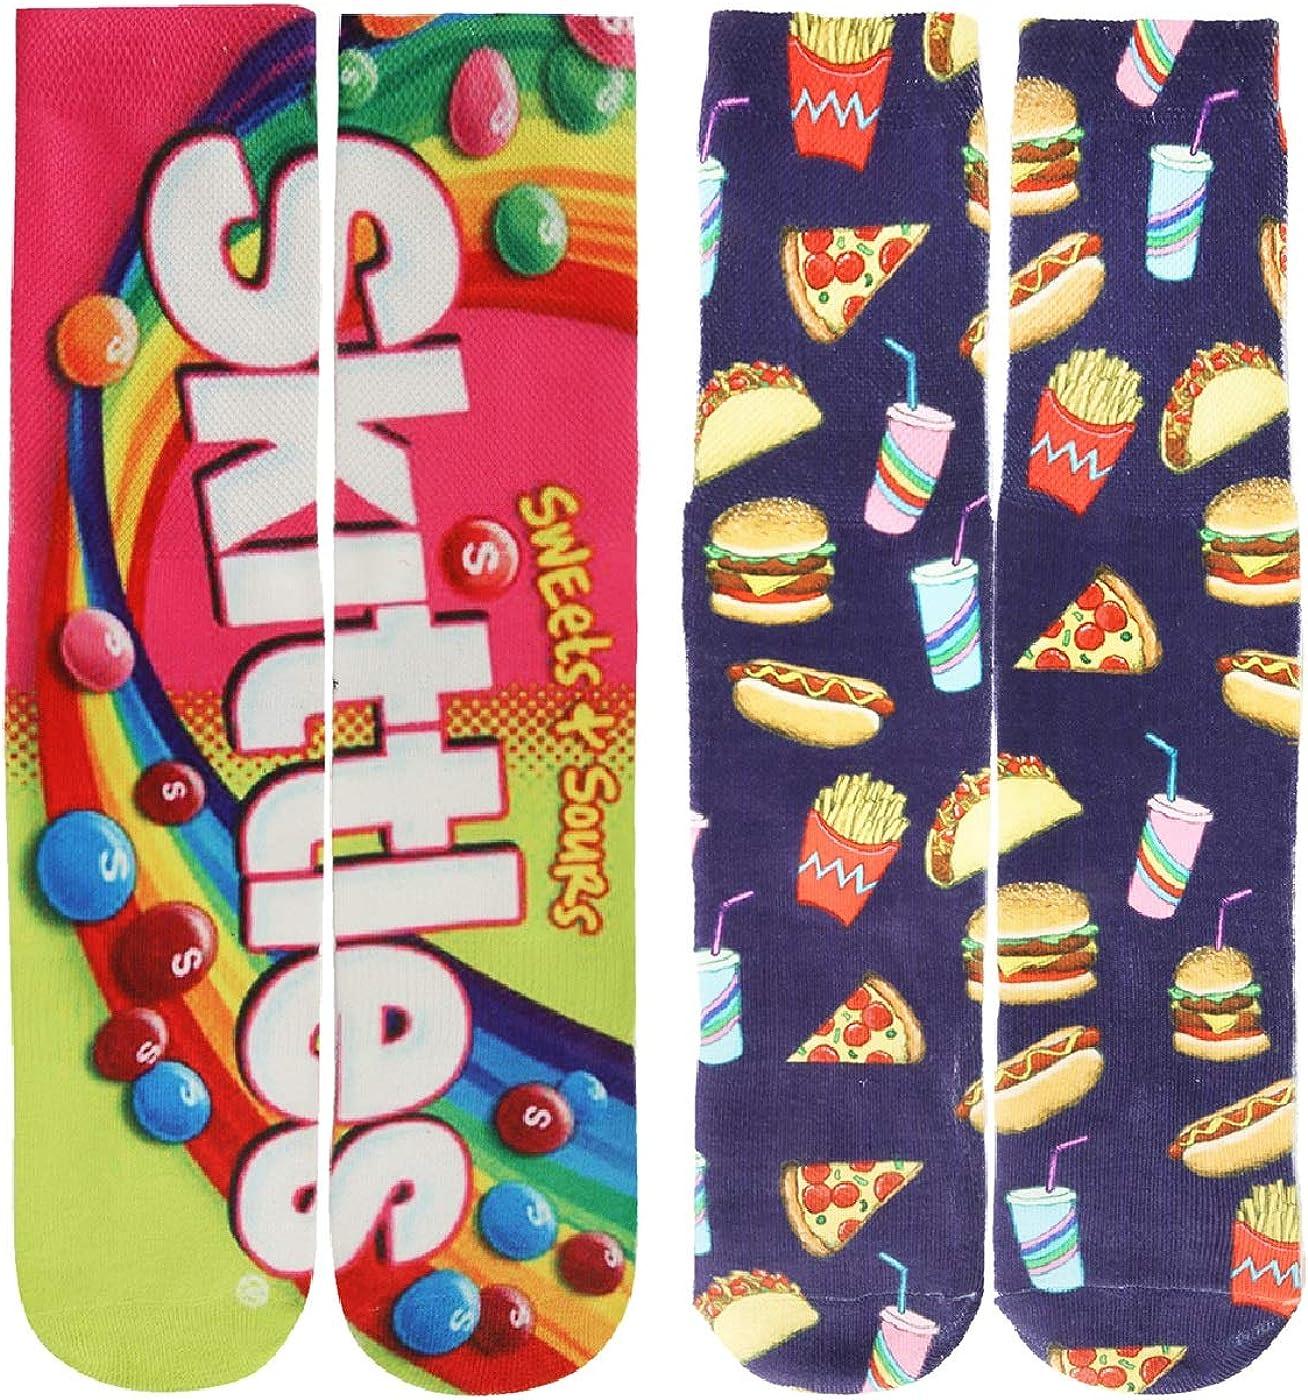 Mens Funny Crazy Socks Boys Teens Funky Colorful 3D Print Pattern Novelty Basketball Tube Socks 2 Pairs